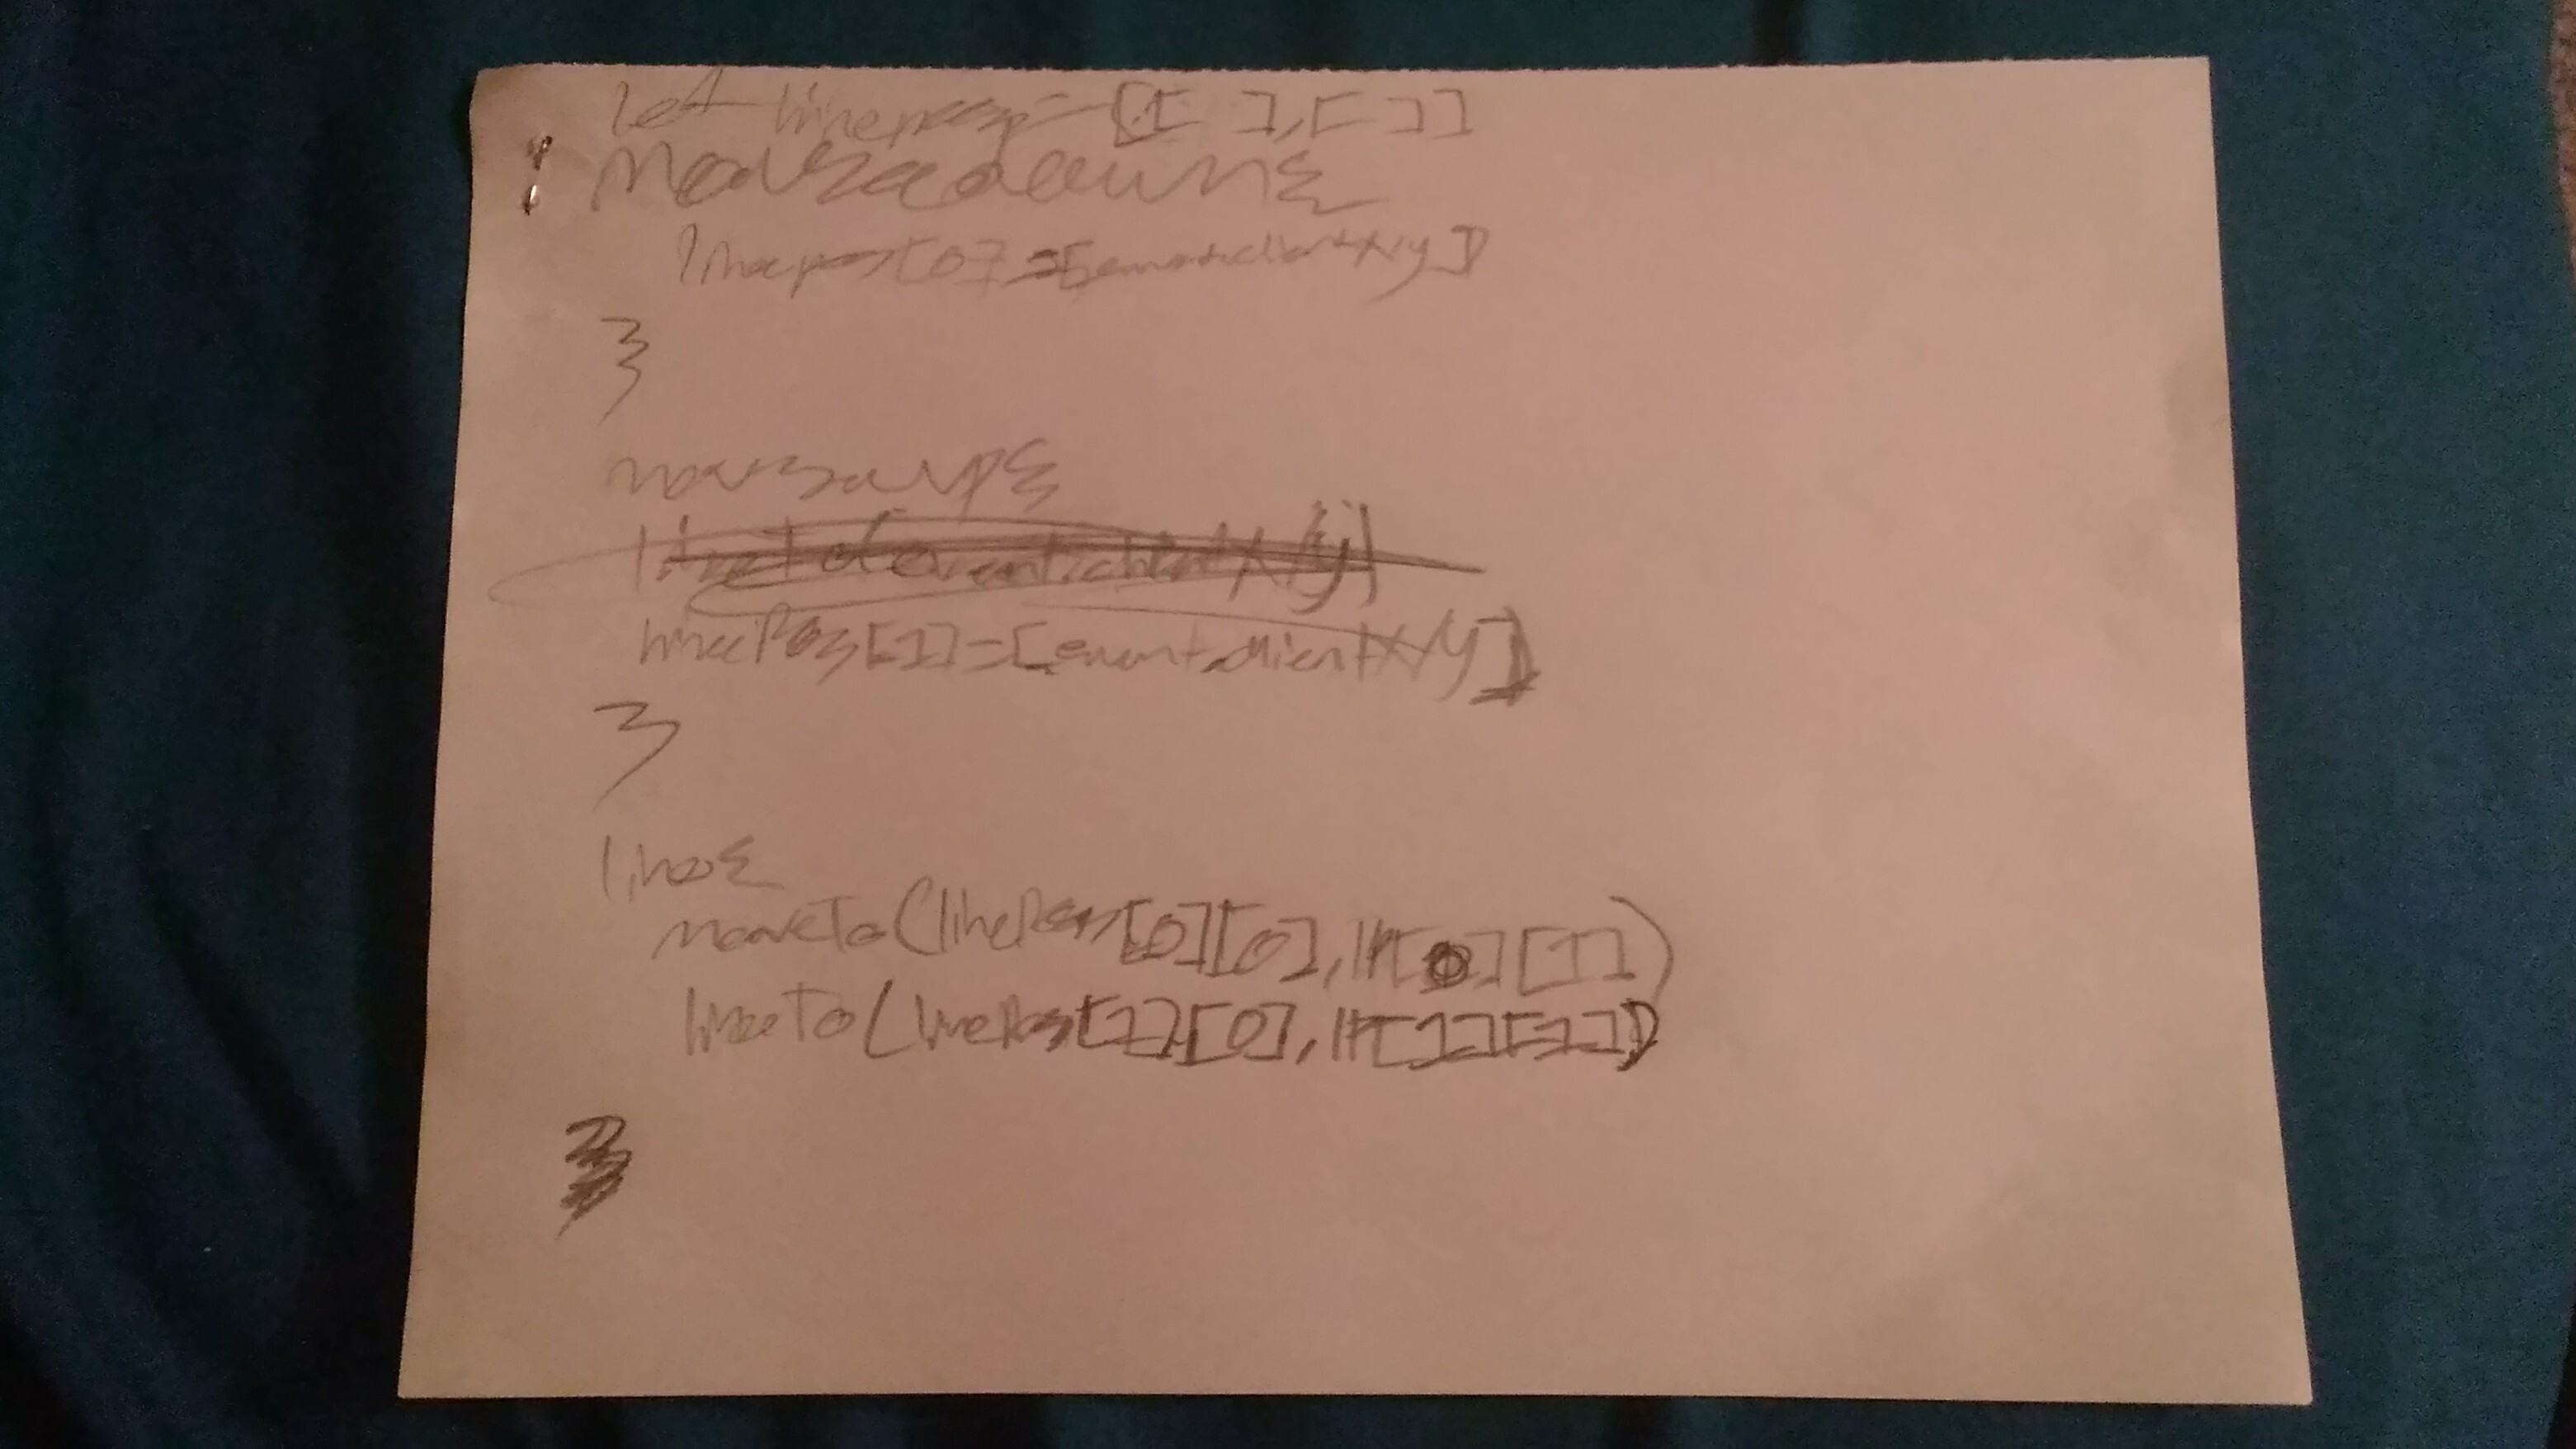 https://cloud-71vyiu9vx.vercel.app/0bad_handwriting.jpg